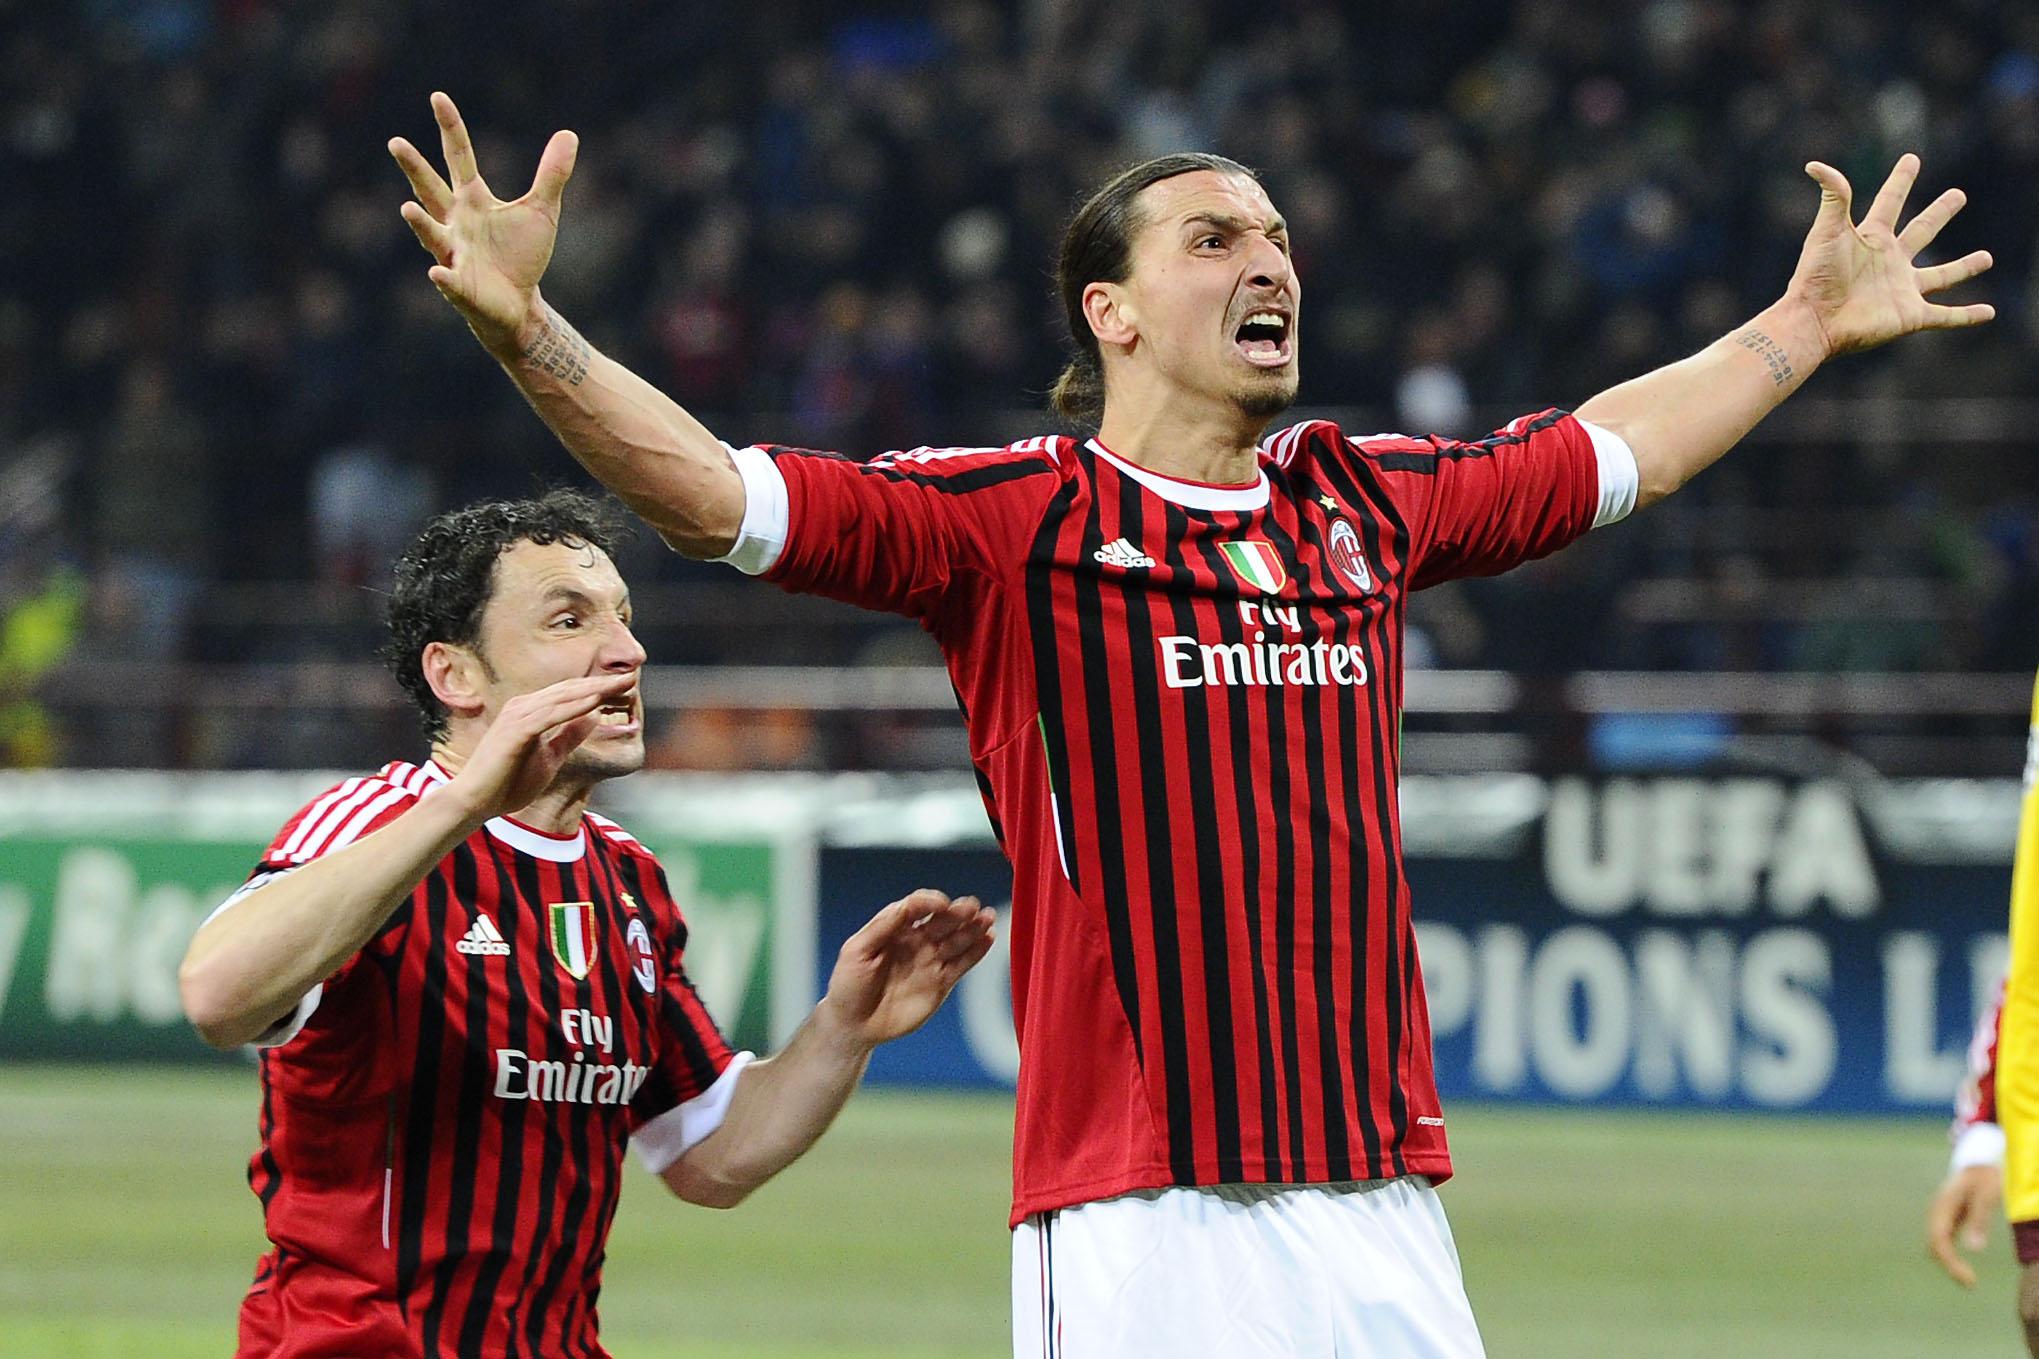 Football - Etranger - Les plus beaux buts d'Ibrahimovic avec l'AC Milan